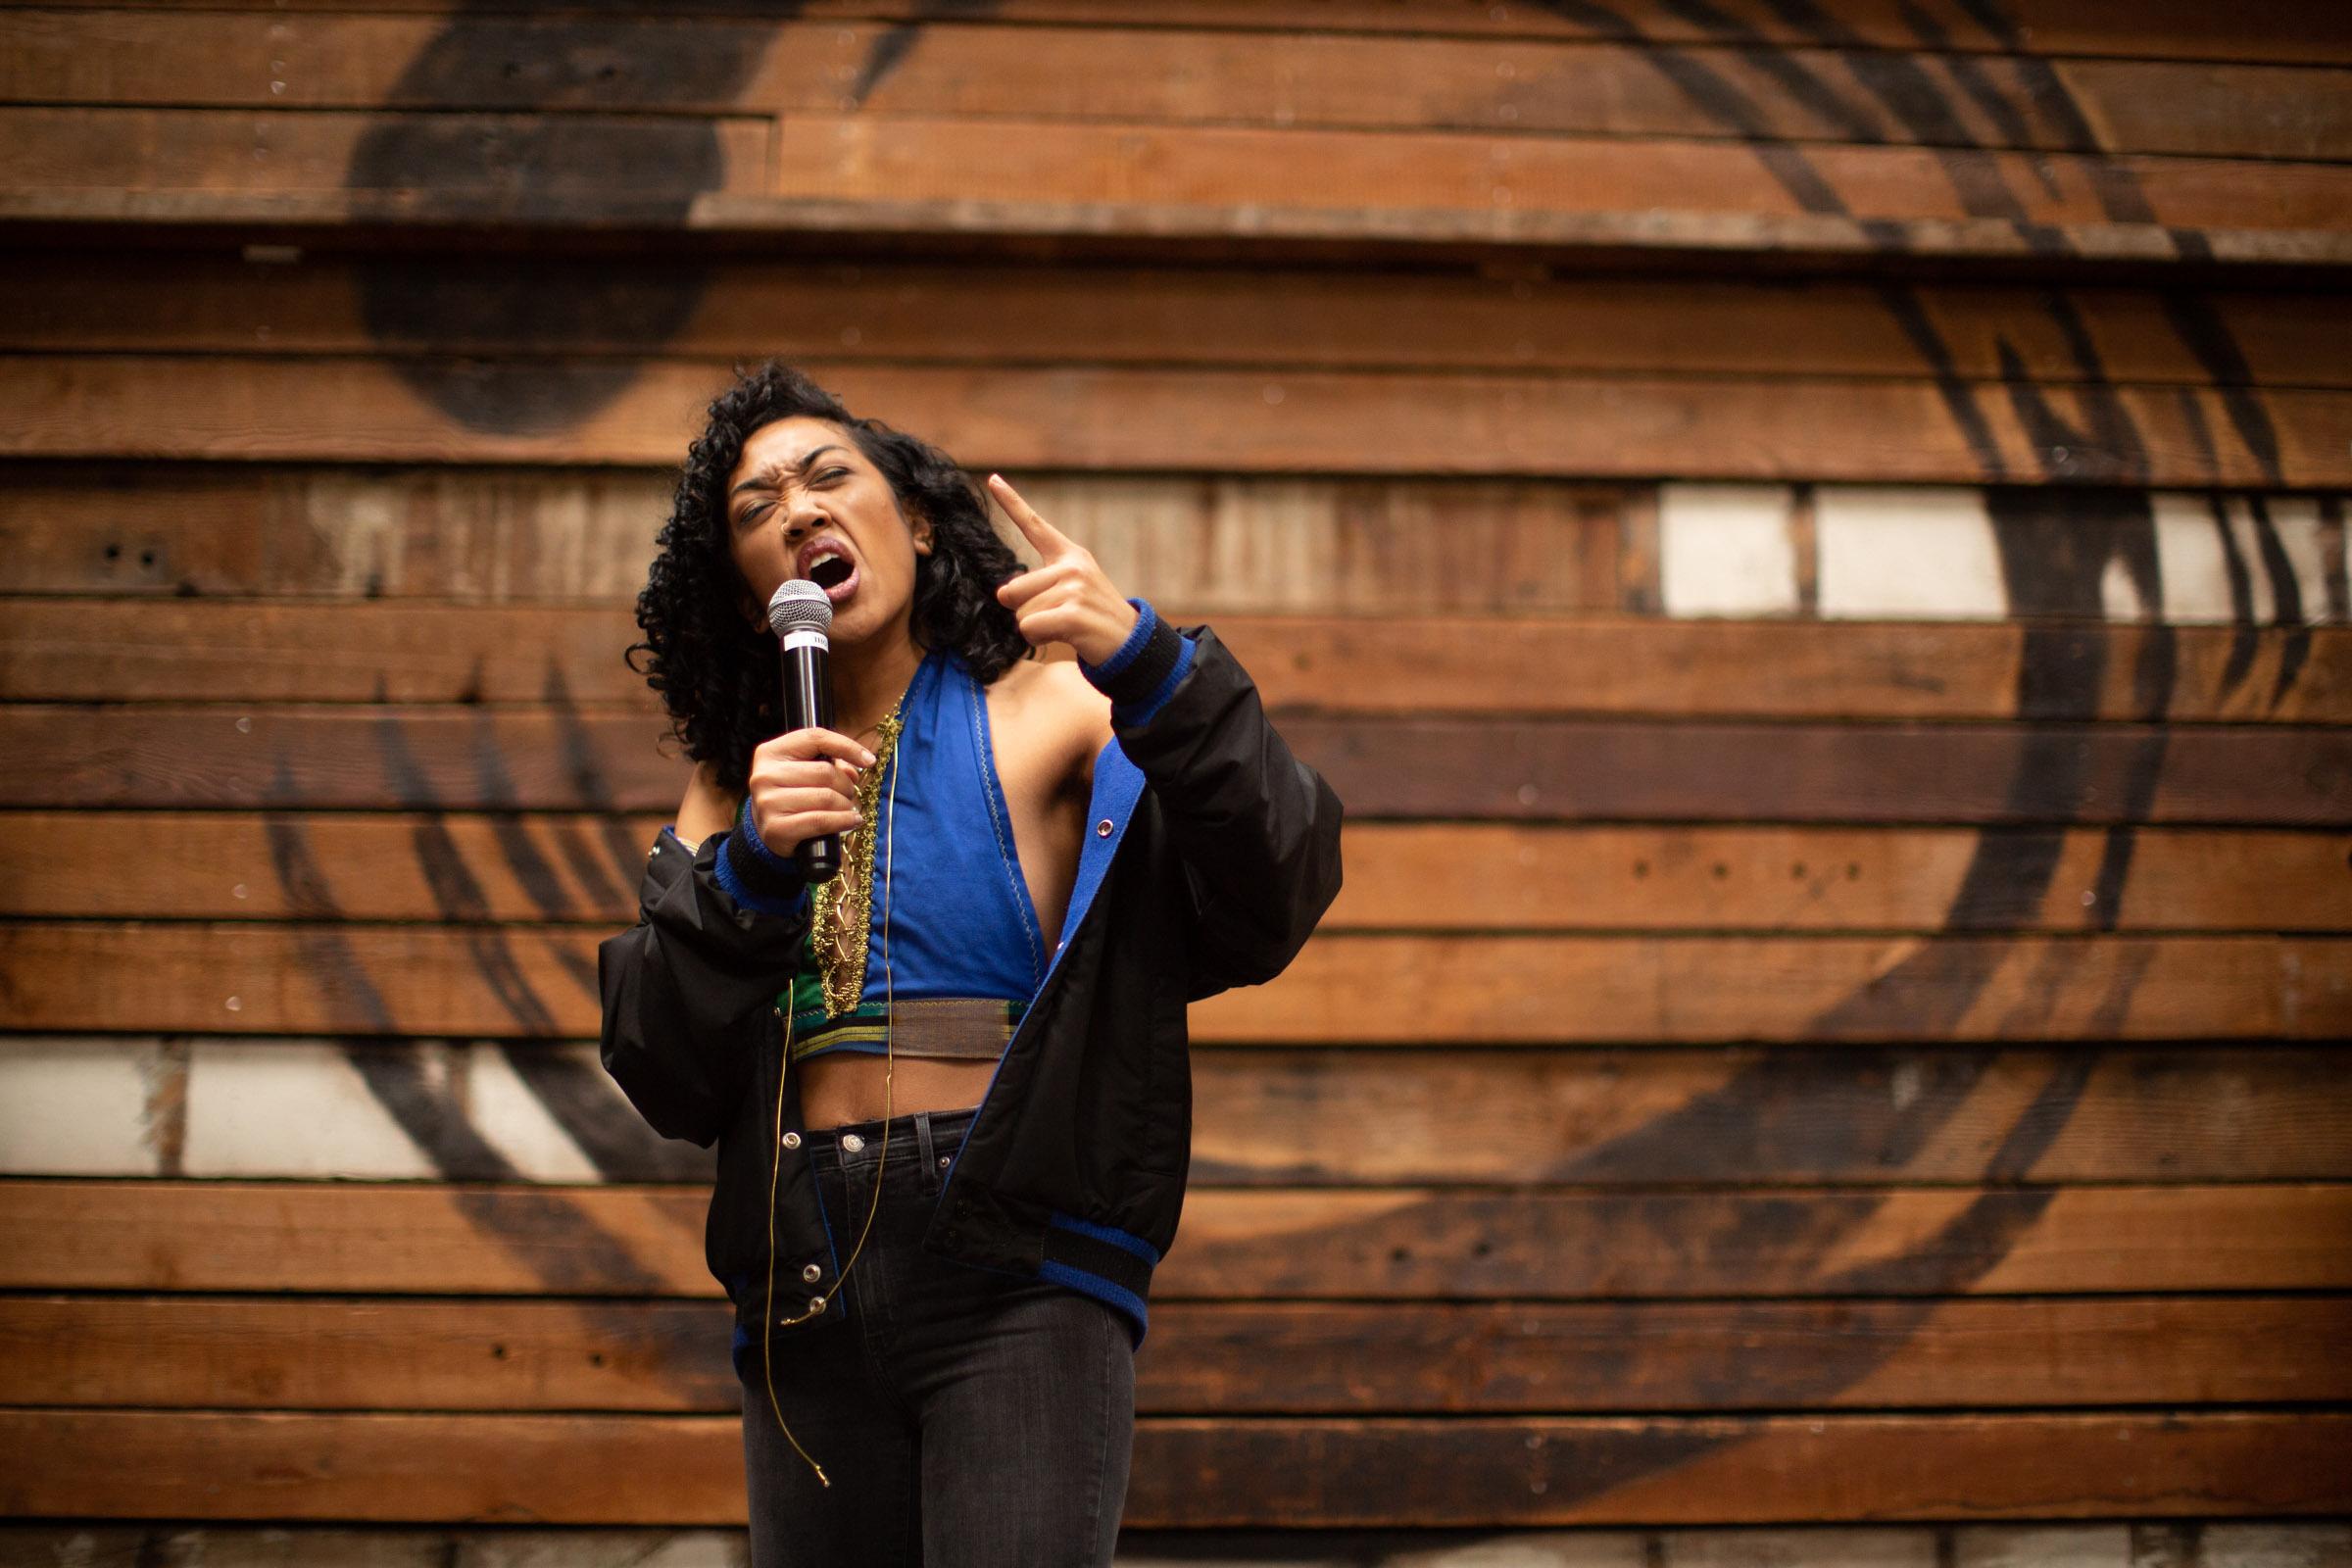 Leilanii Rose, a community based performance artist. Photo by Tumay Aslay.